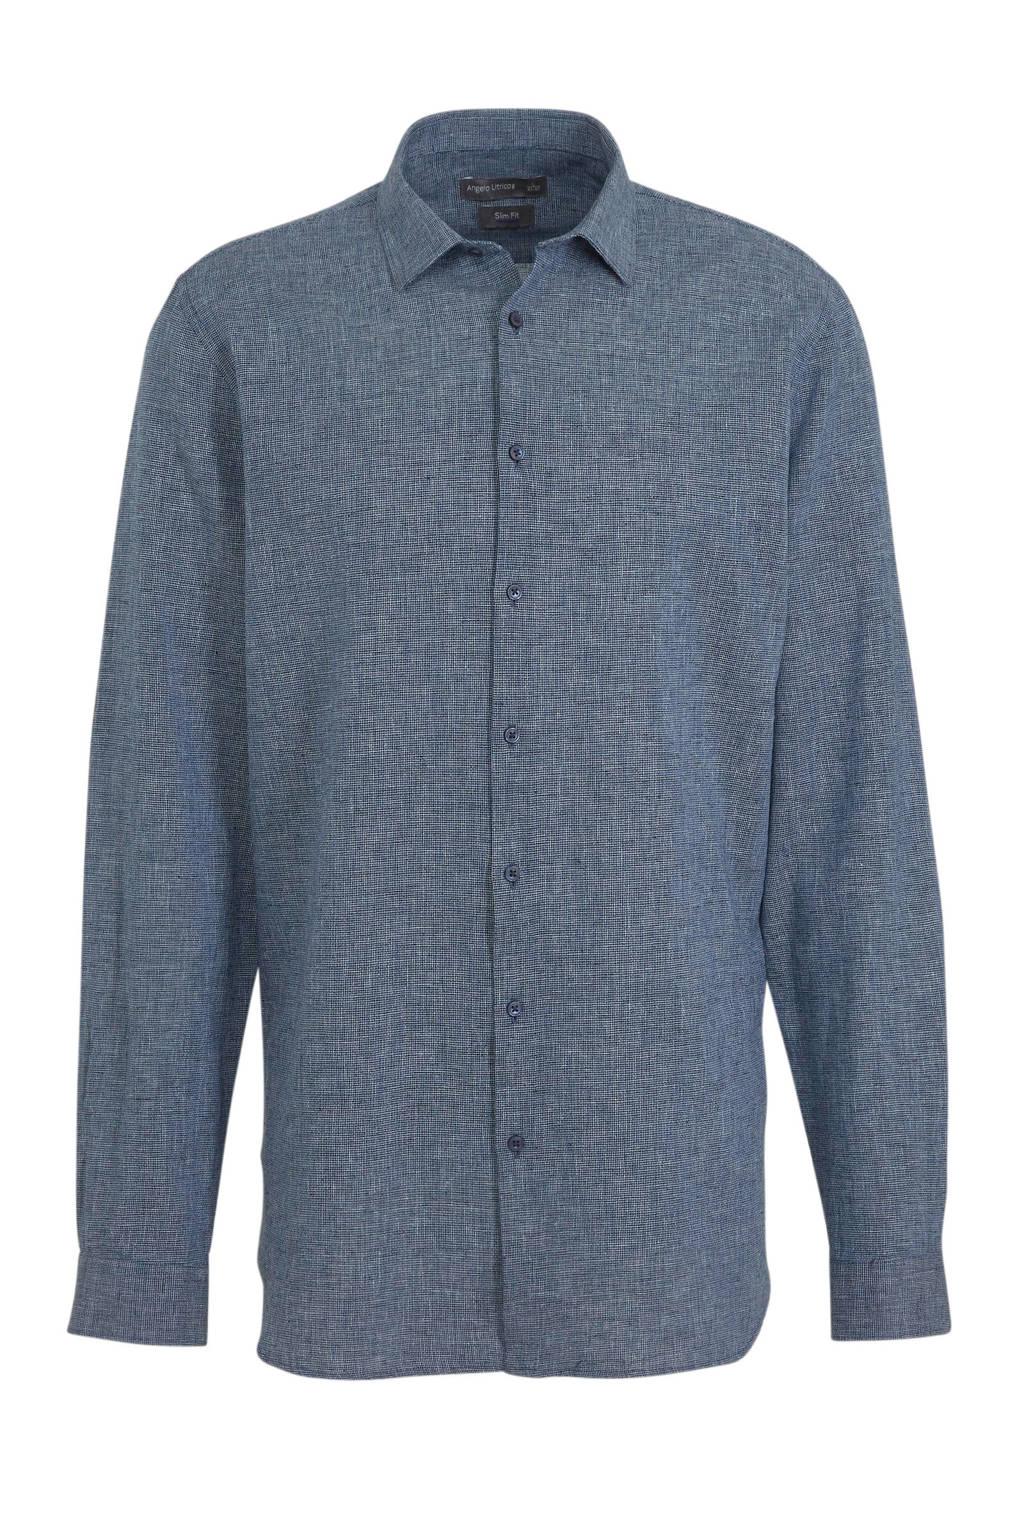 C&A Angelo Litrico linnen slim fit overhemd donkerblauw, Donkerblauw